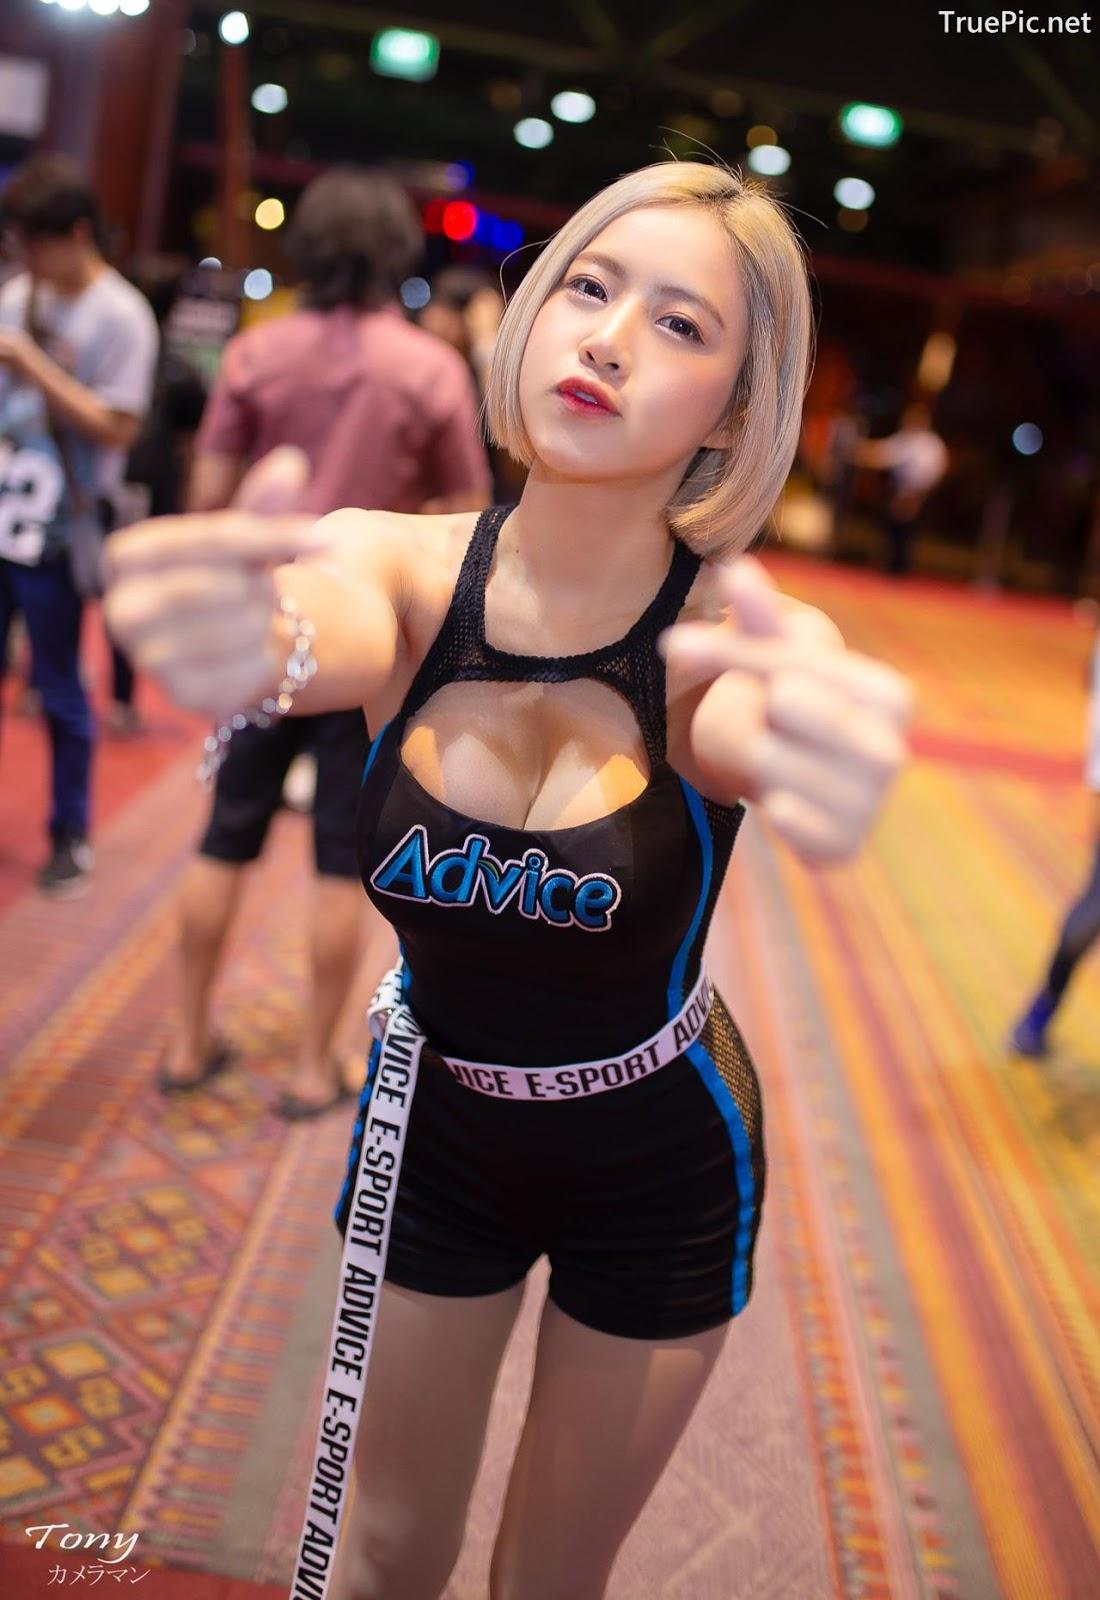 Image-Thailand-Hot-Model-Thai-PG-At-Commart-2018-TruePic.net- Picture-39